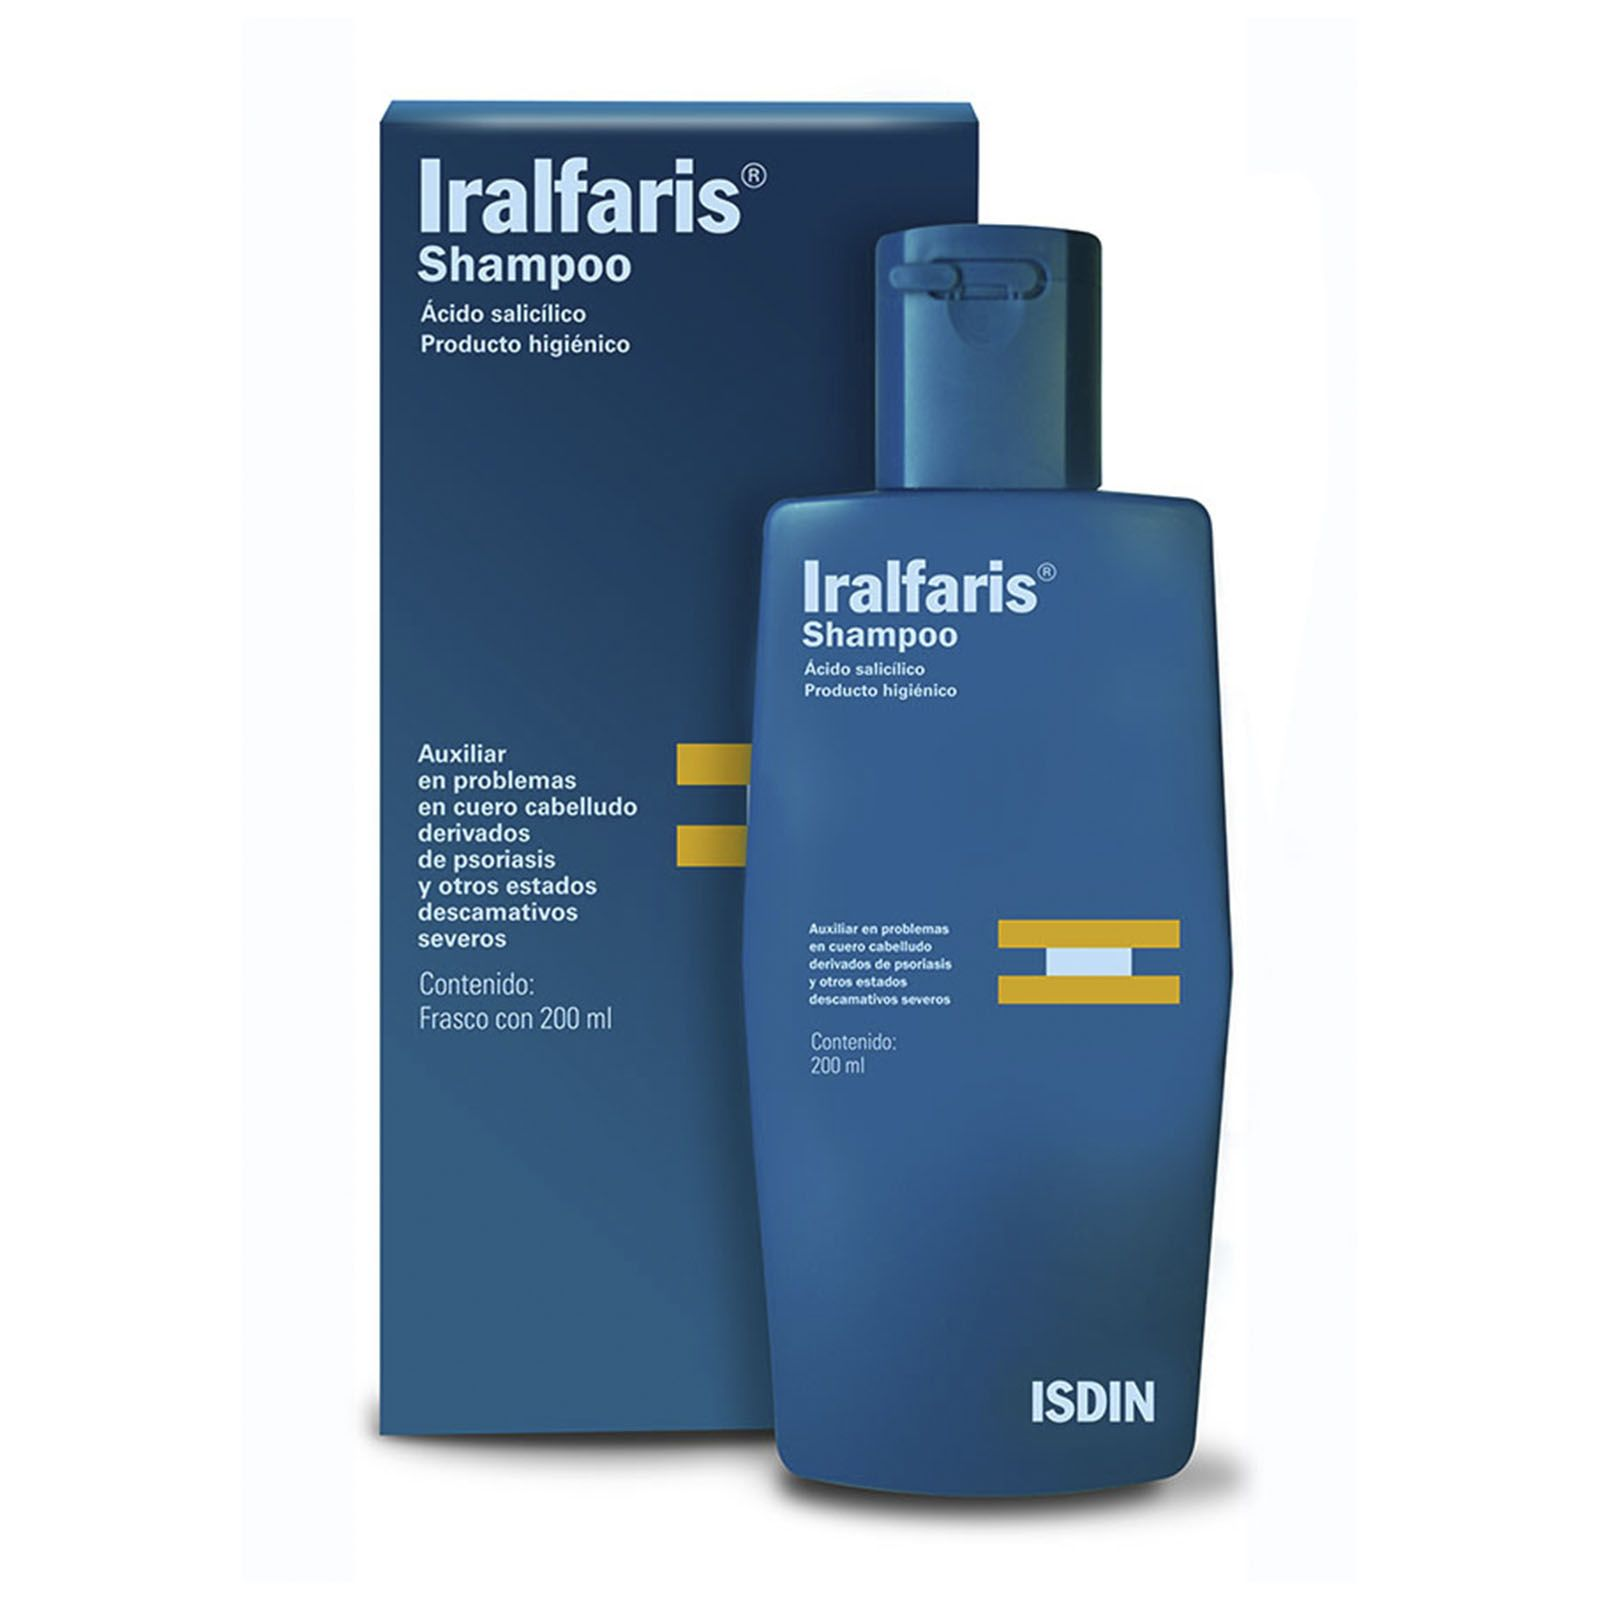 Comprar Iralfaris 3 Ml 1 Frasco Shampoo 200 Ml